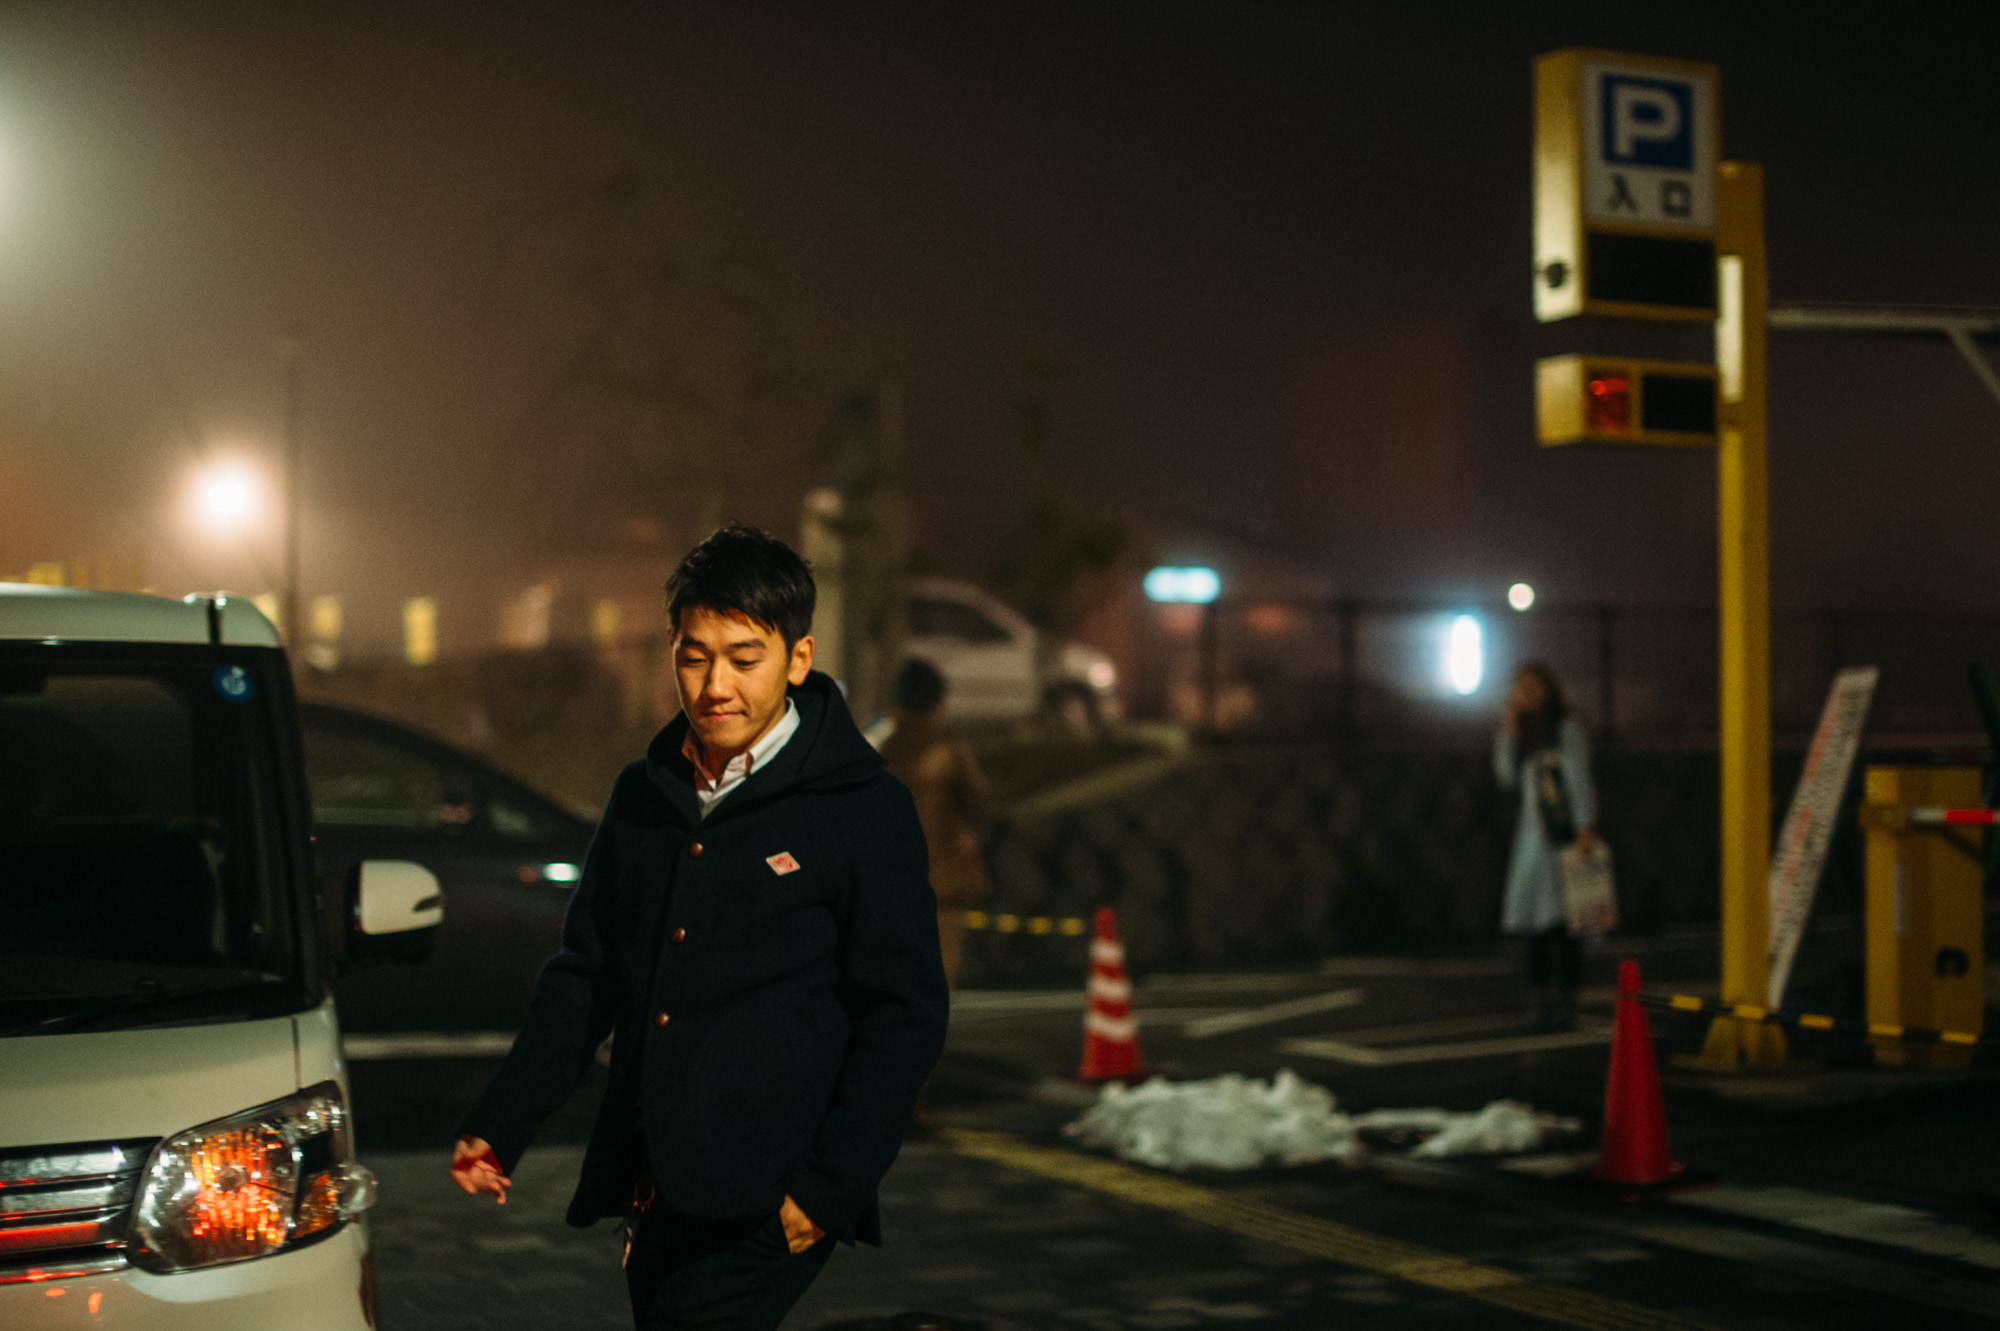 福知山前撮り89